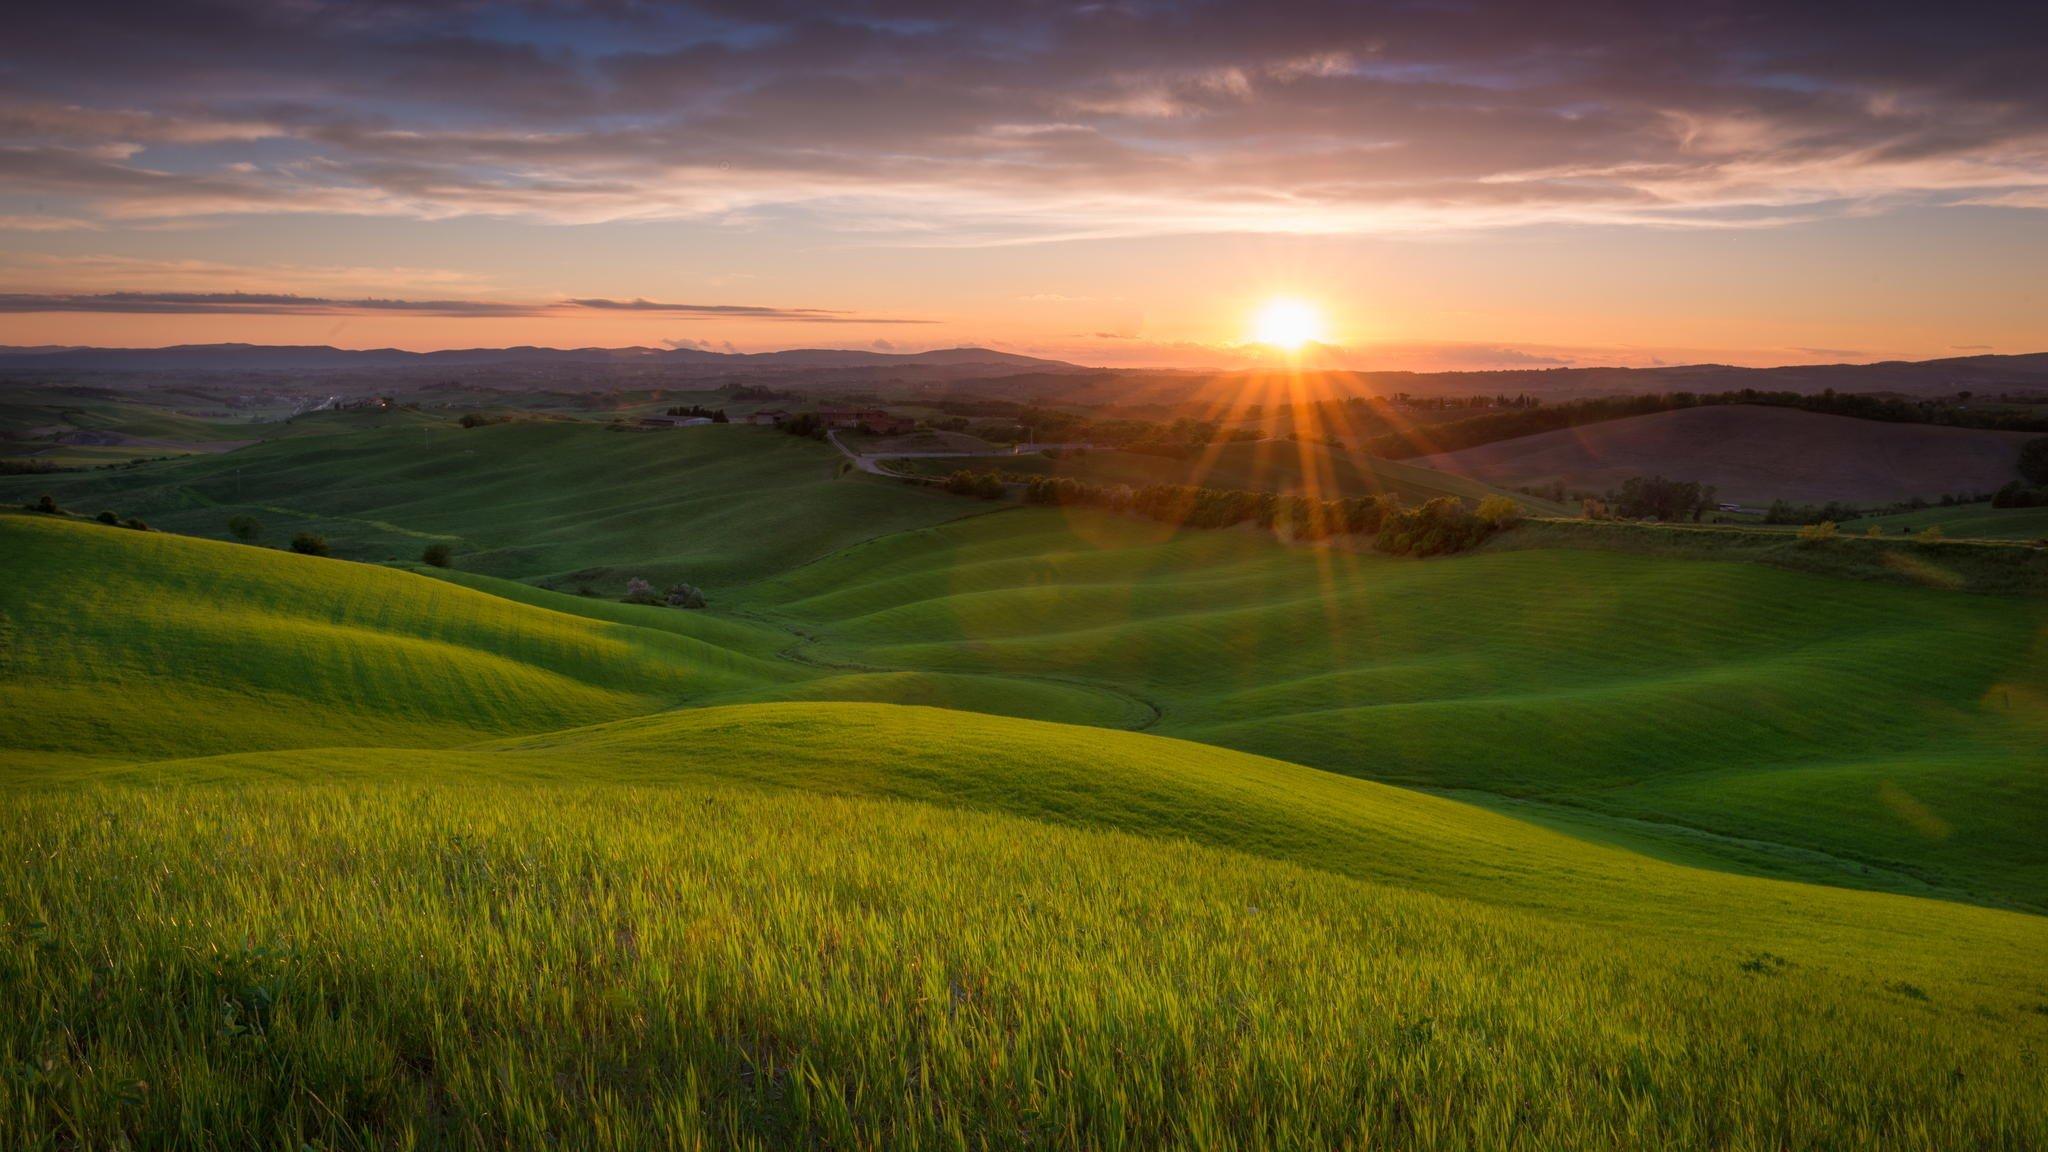 Wallpapersafari: Tuscany Italy Wallpaper